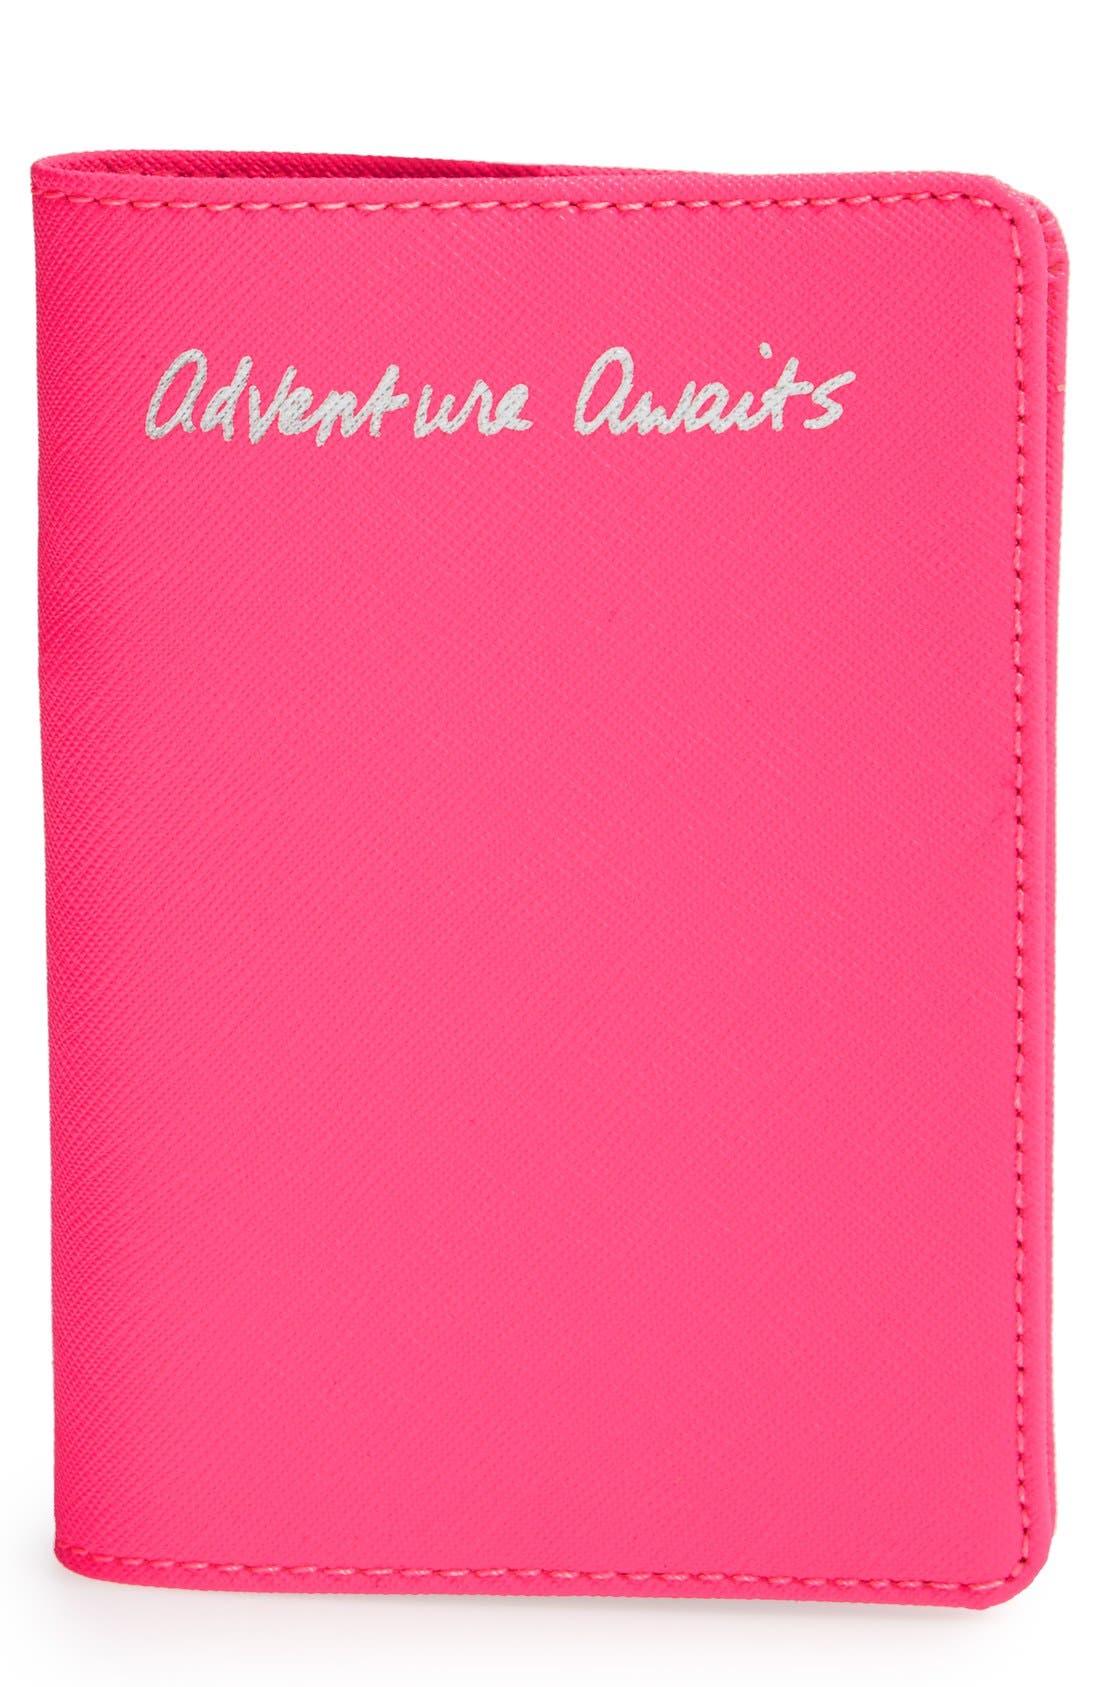 Alternate Image 1 Selected - Rebecca Minkoff 'Adventure Awaits' Passport Holder